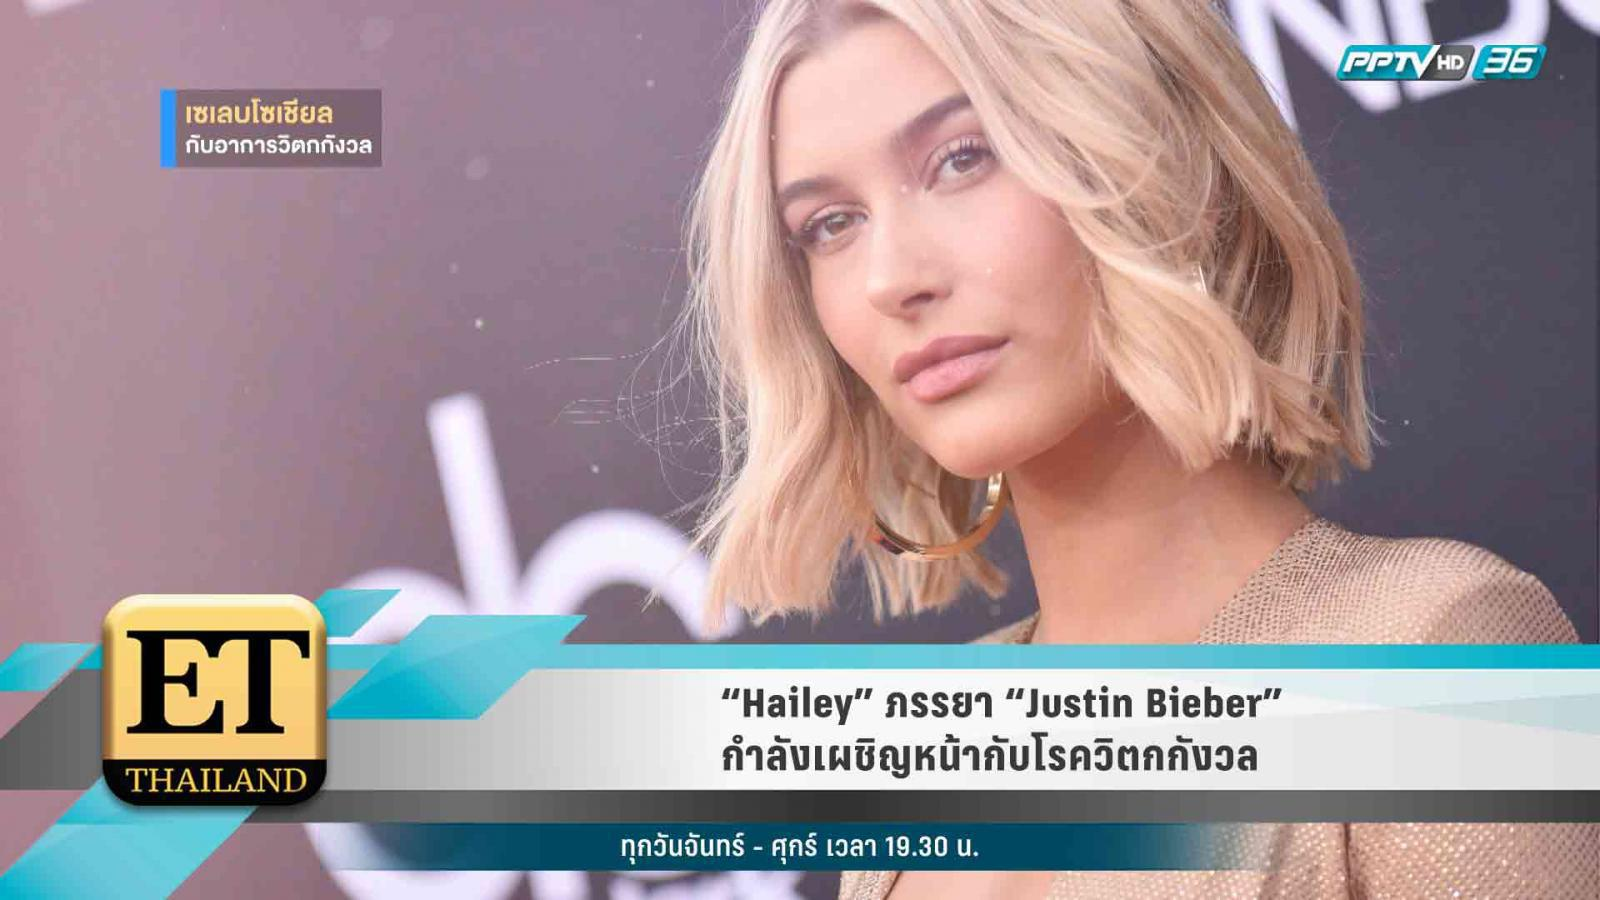 Hailey ภรรยา Justin Bieber กำลังเผชิญหน้ากับโรควิตกกังวล